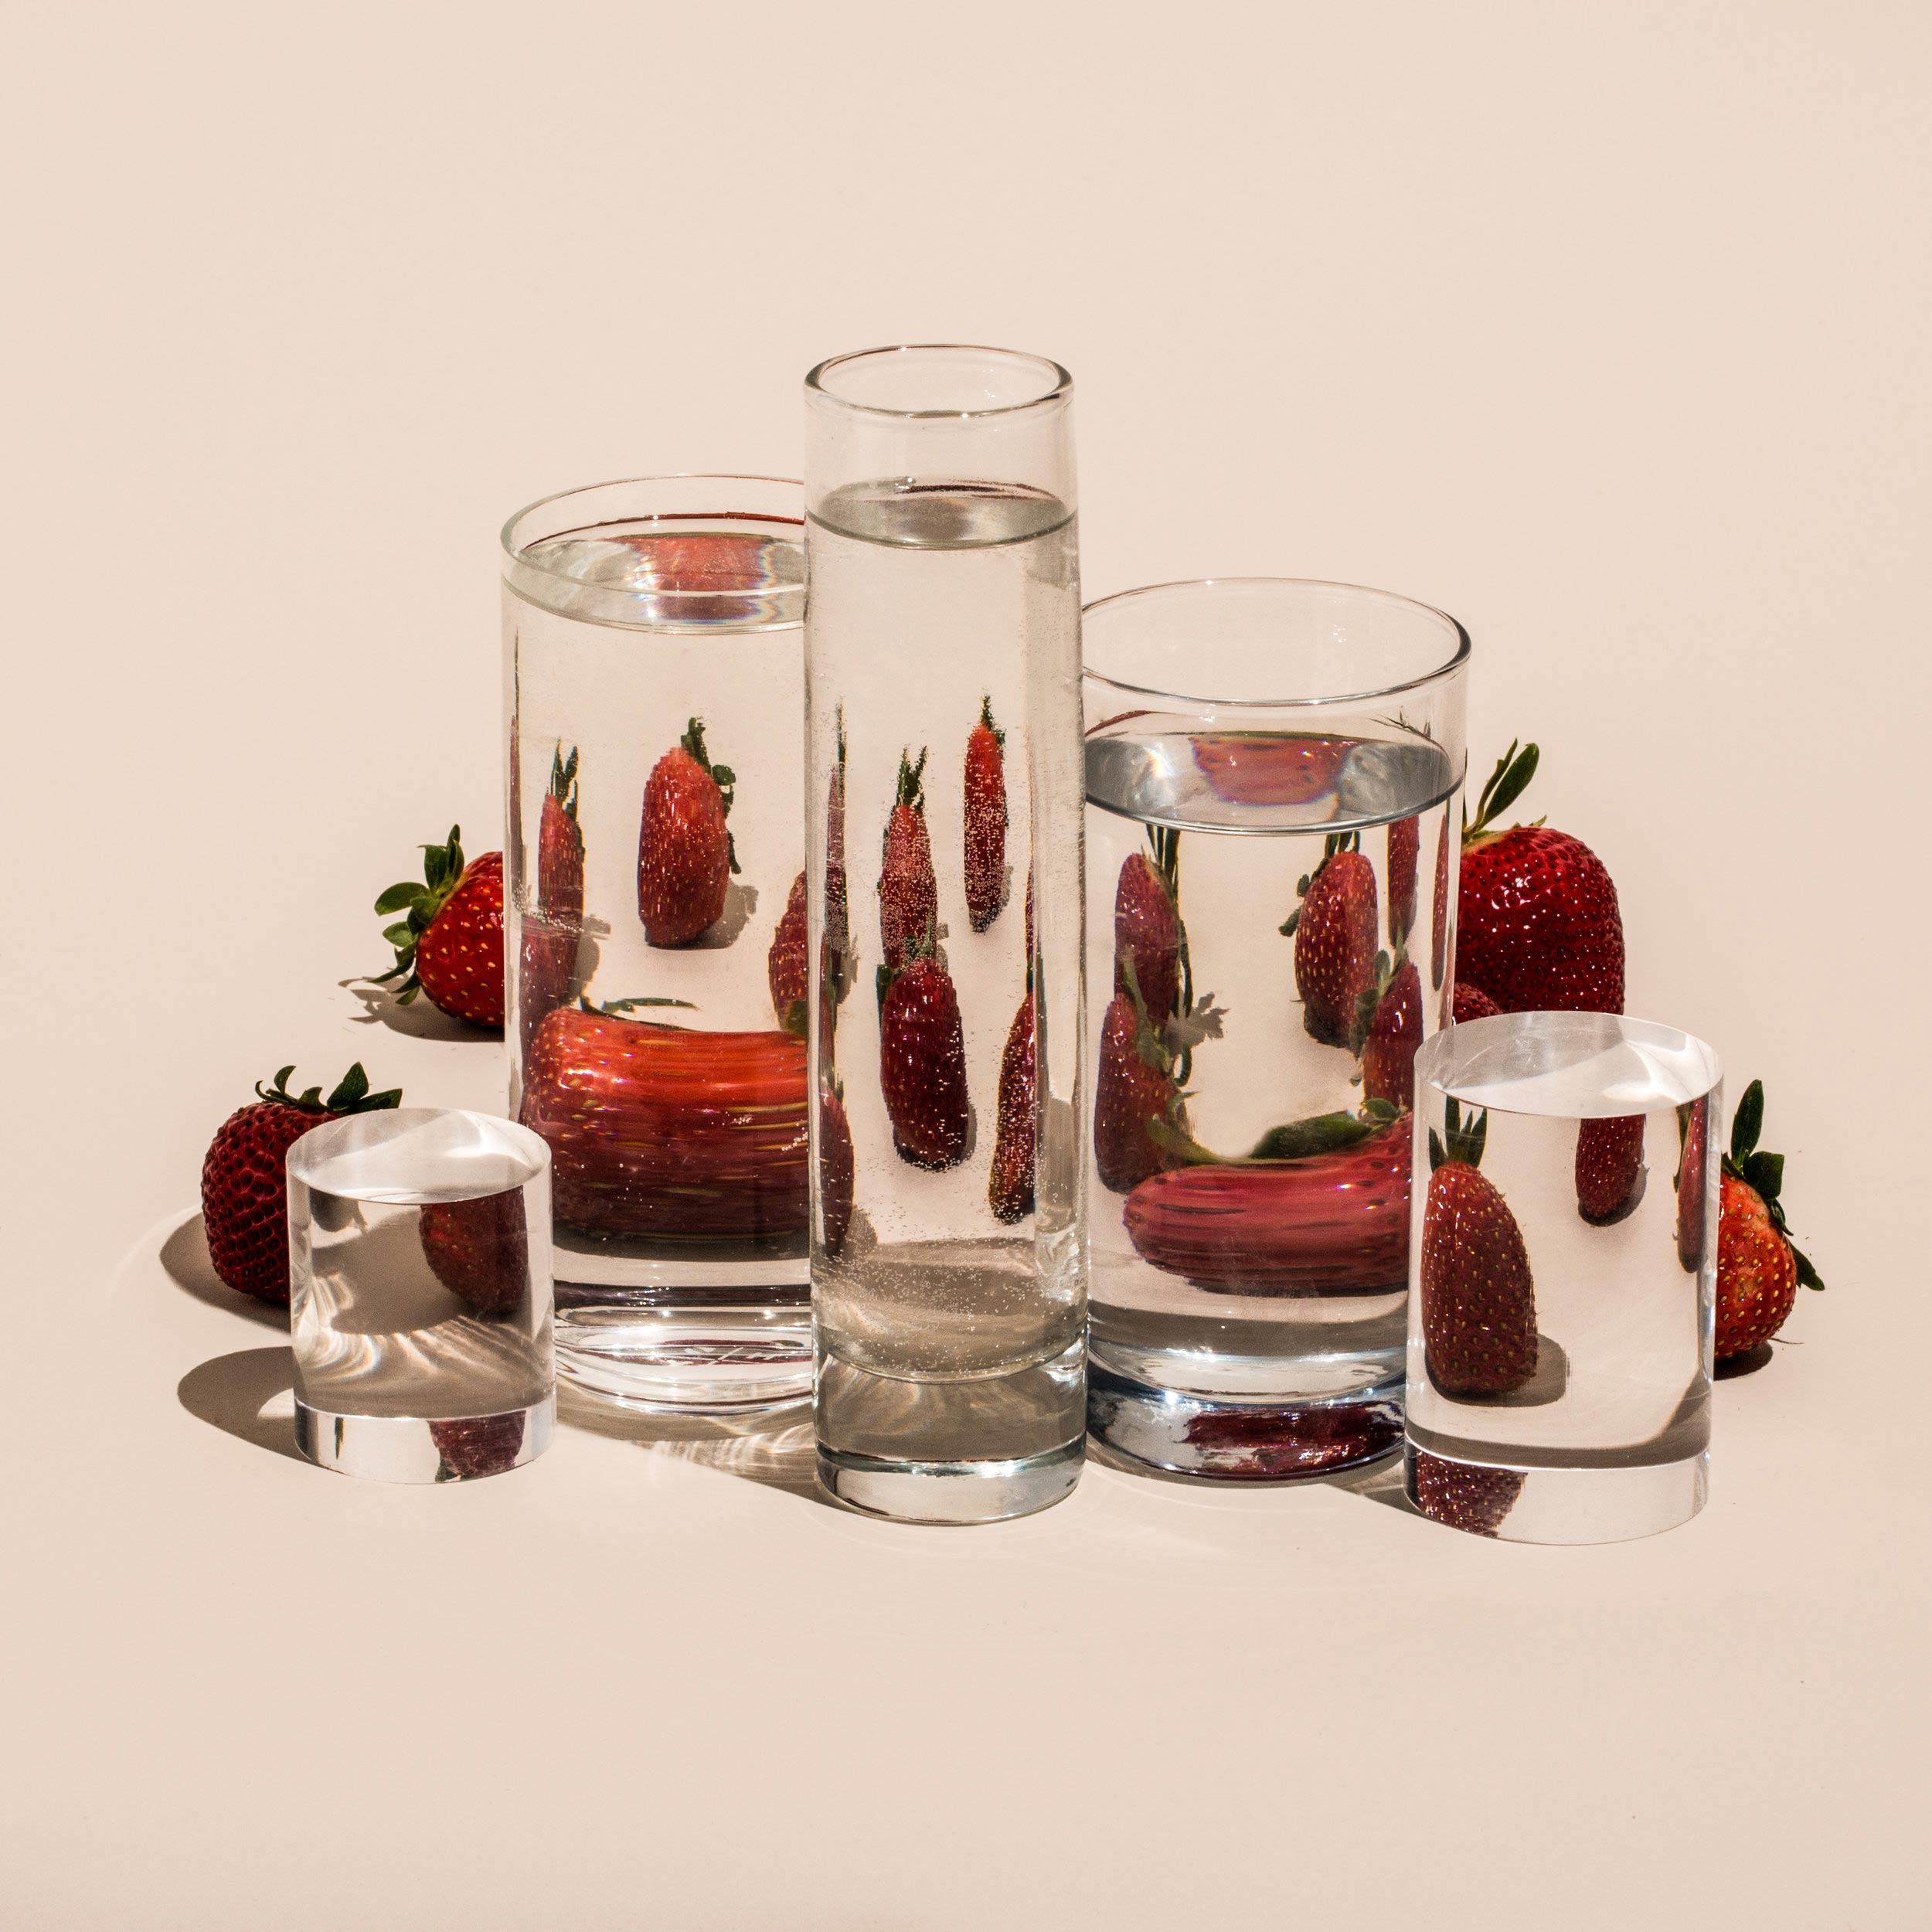 distorded-susan-sakoff-still-life-photography